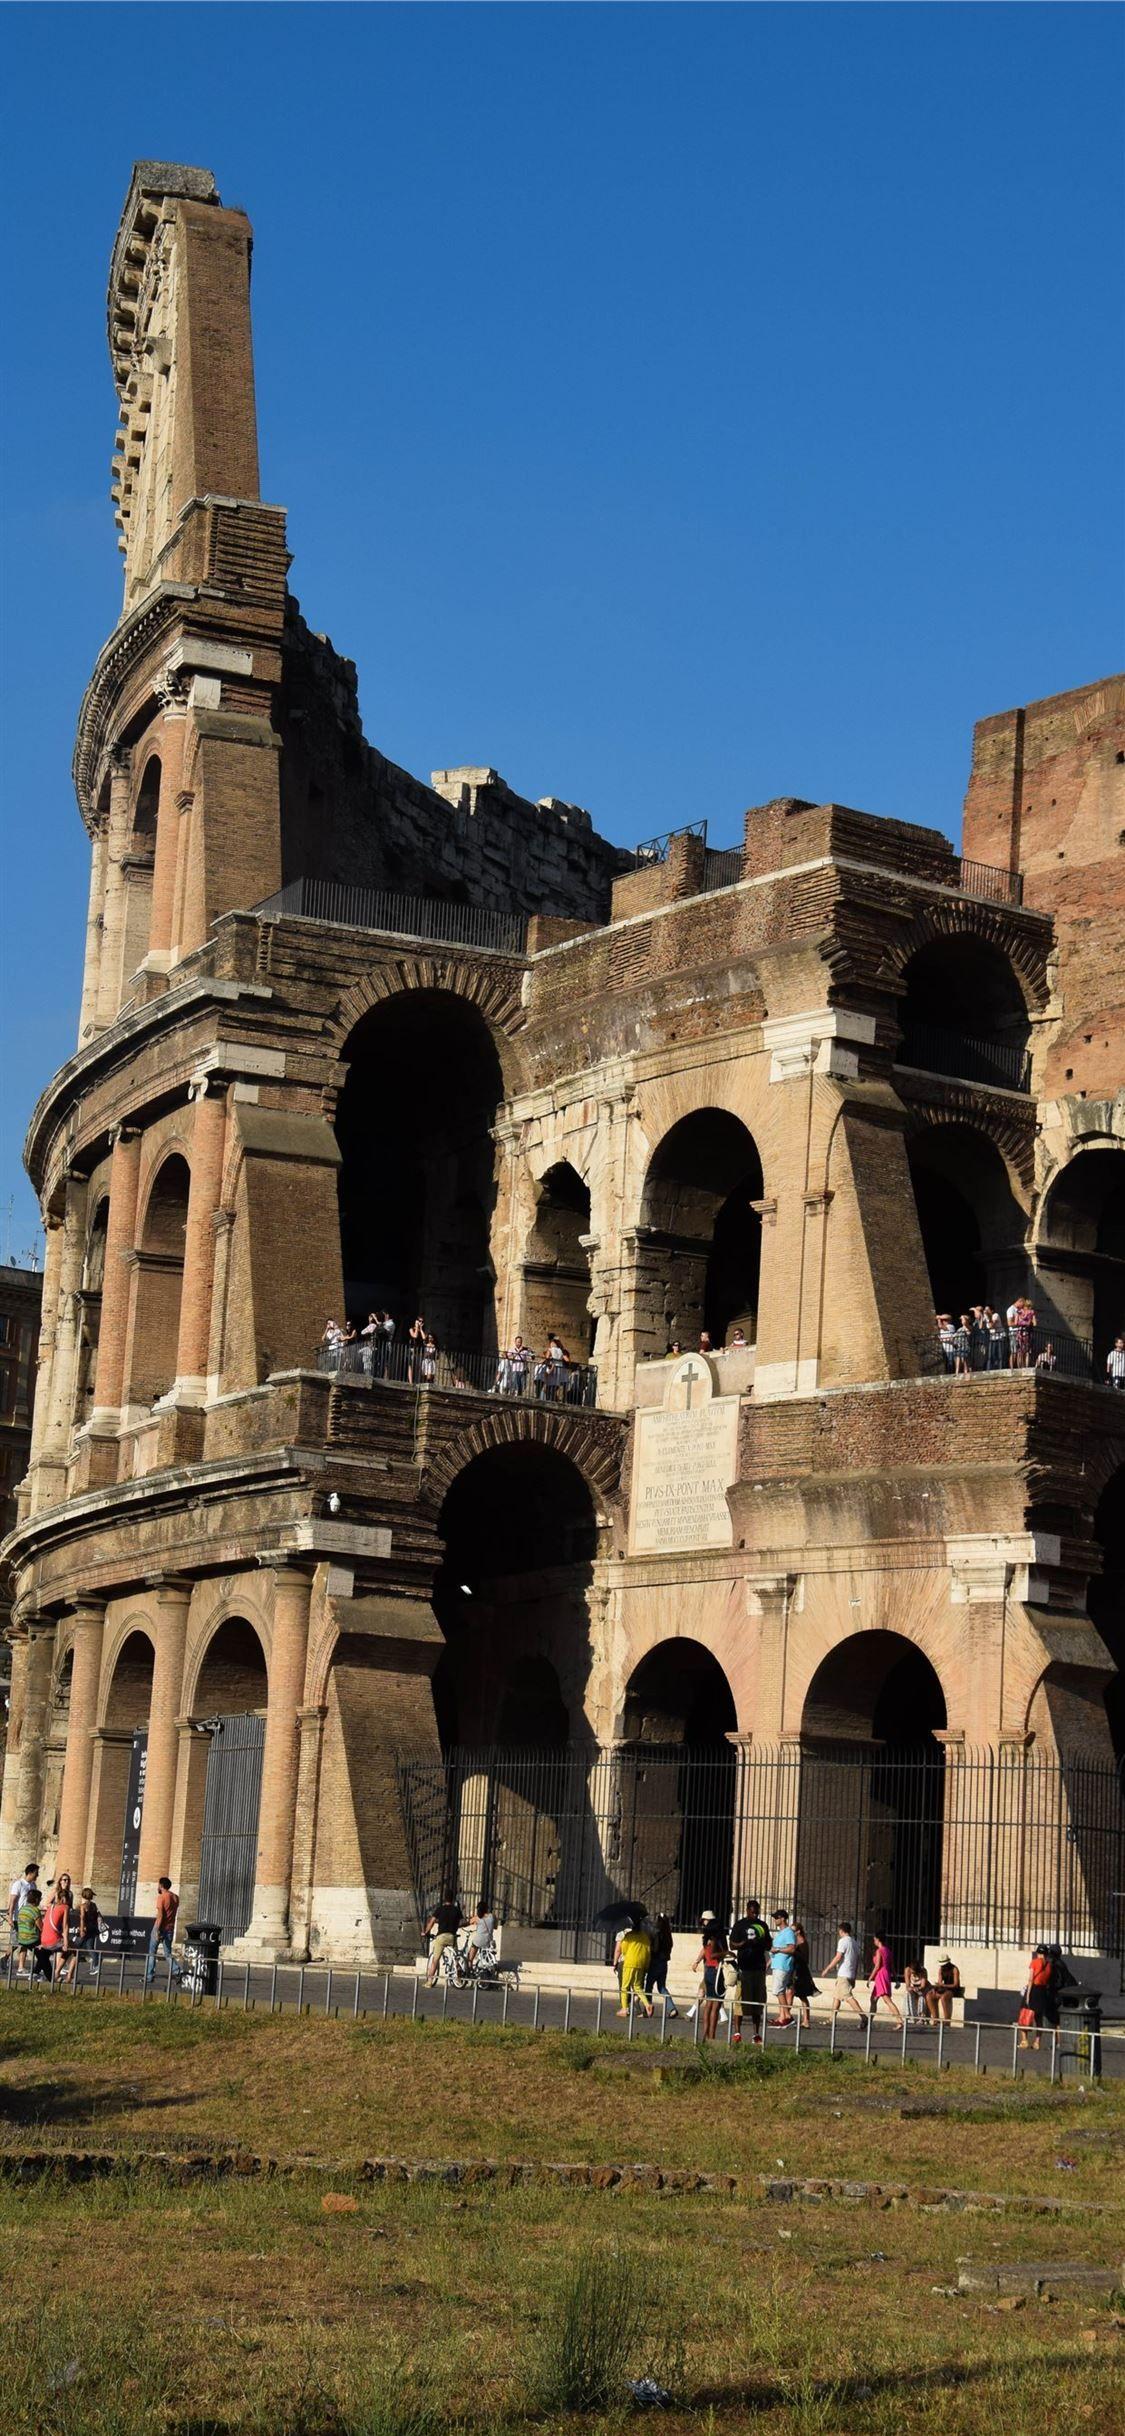 Colosseum of Rome ColosseumofRome